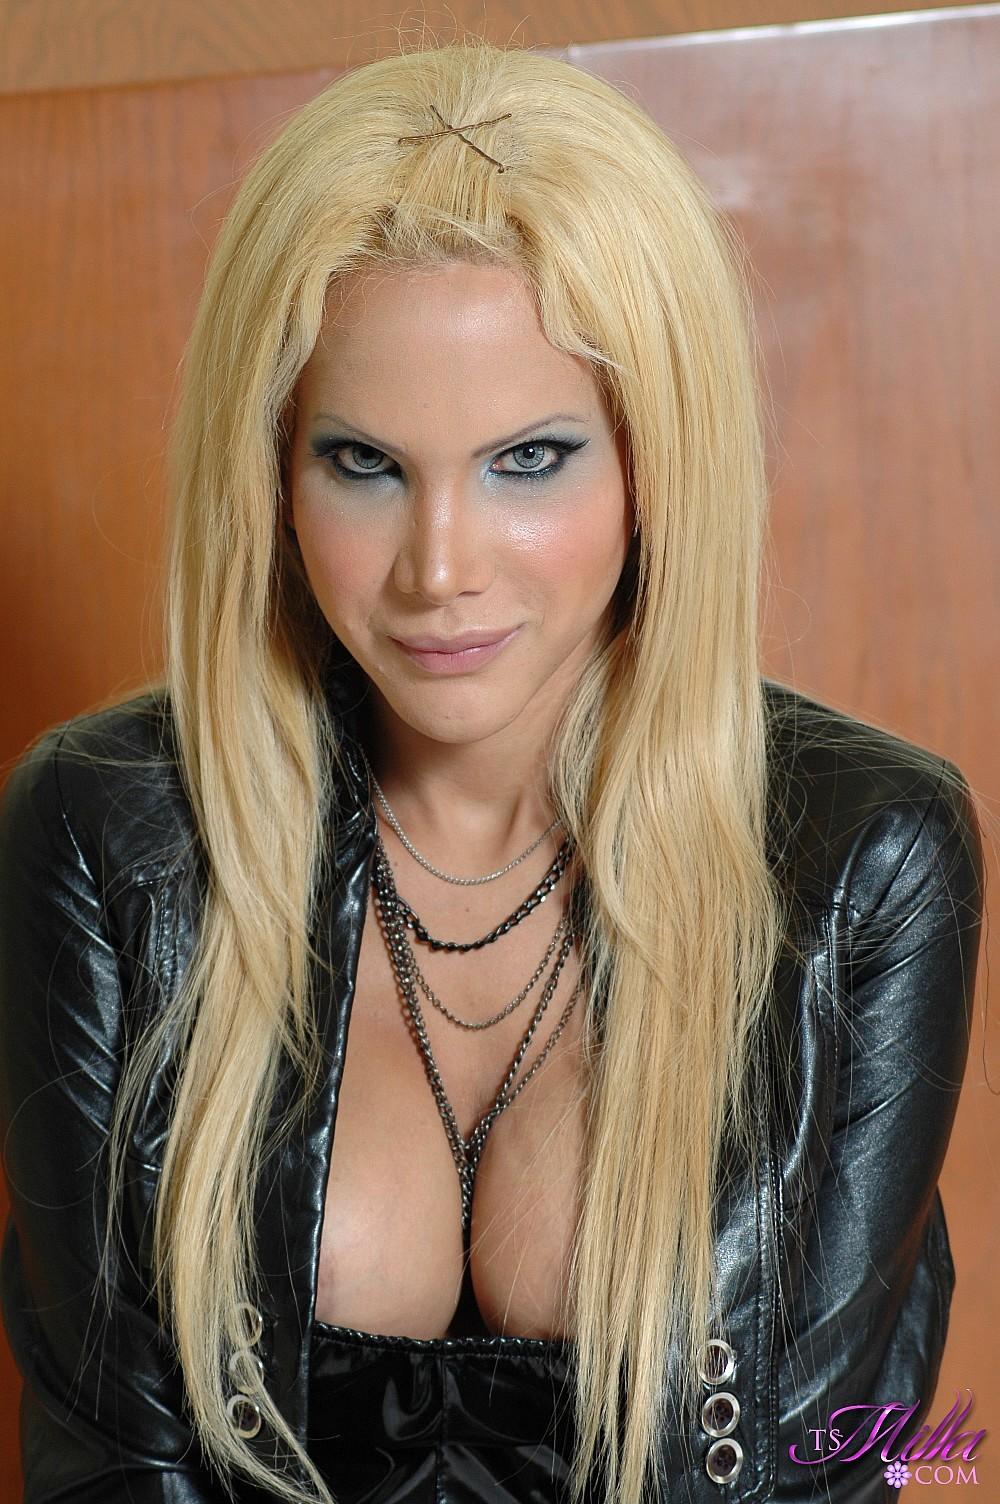 Blonde Tgirl Rocking It In B Lack Leather